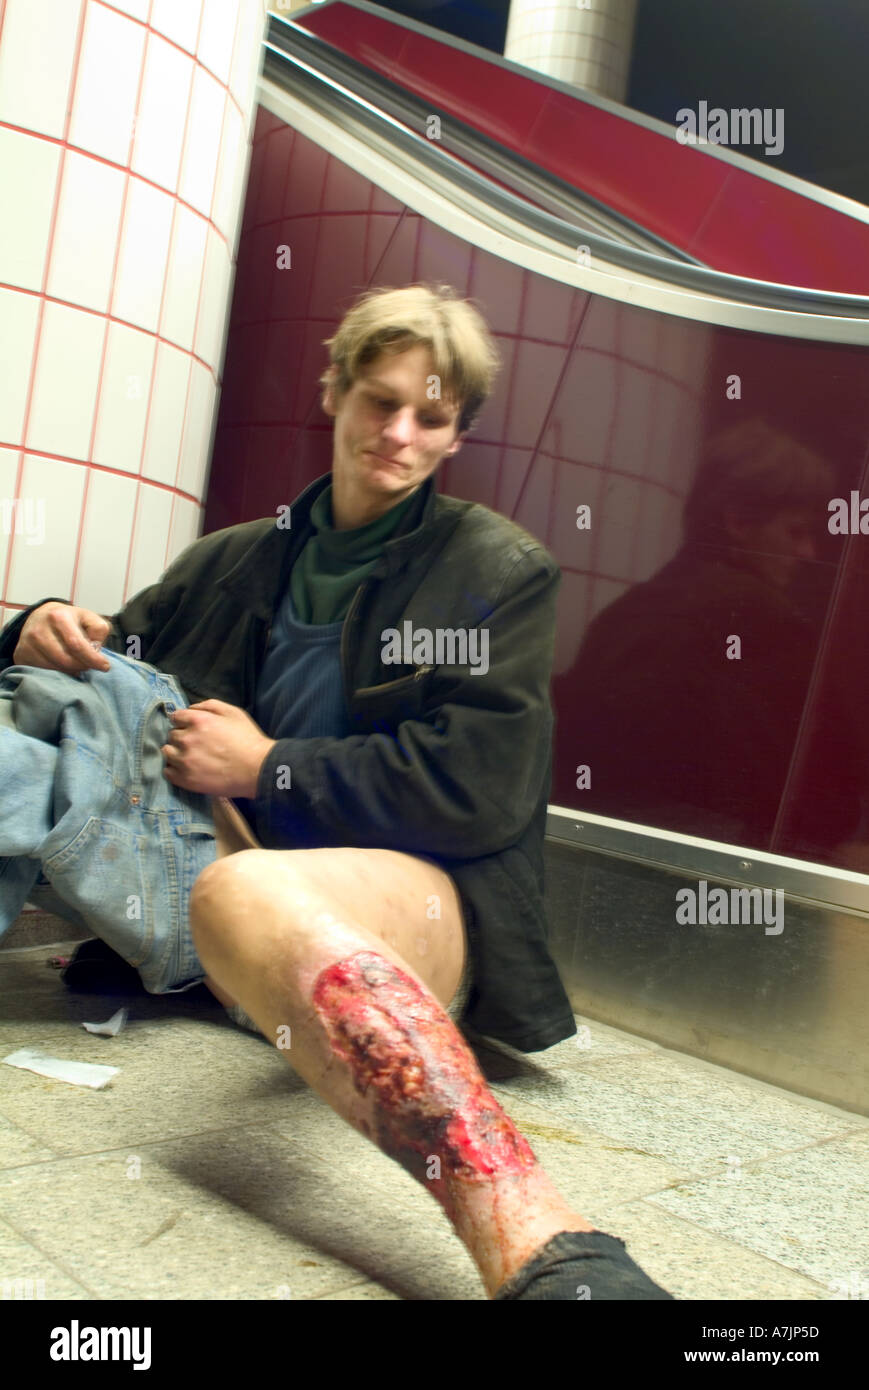 Addict And Hiv Positiv With Open Wound In Hamburg Underground